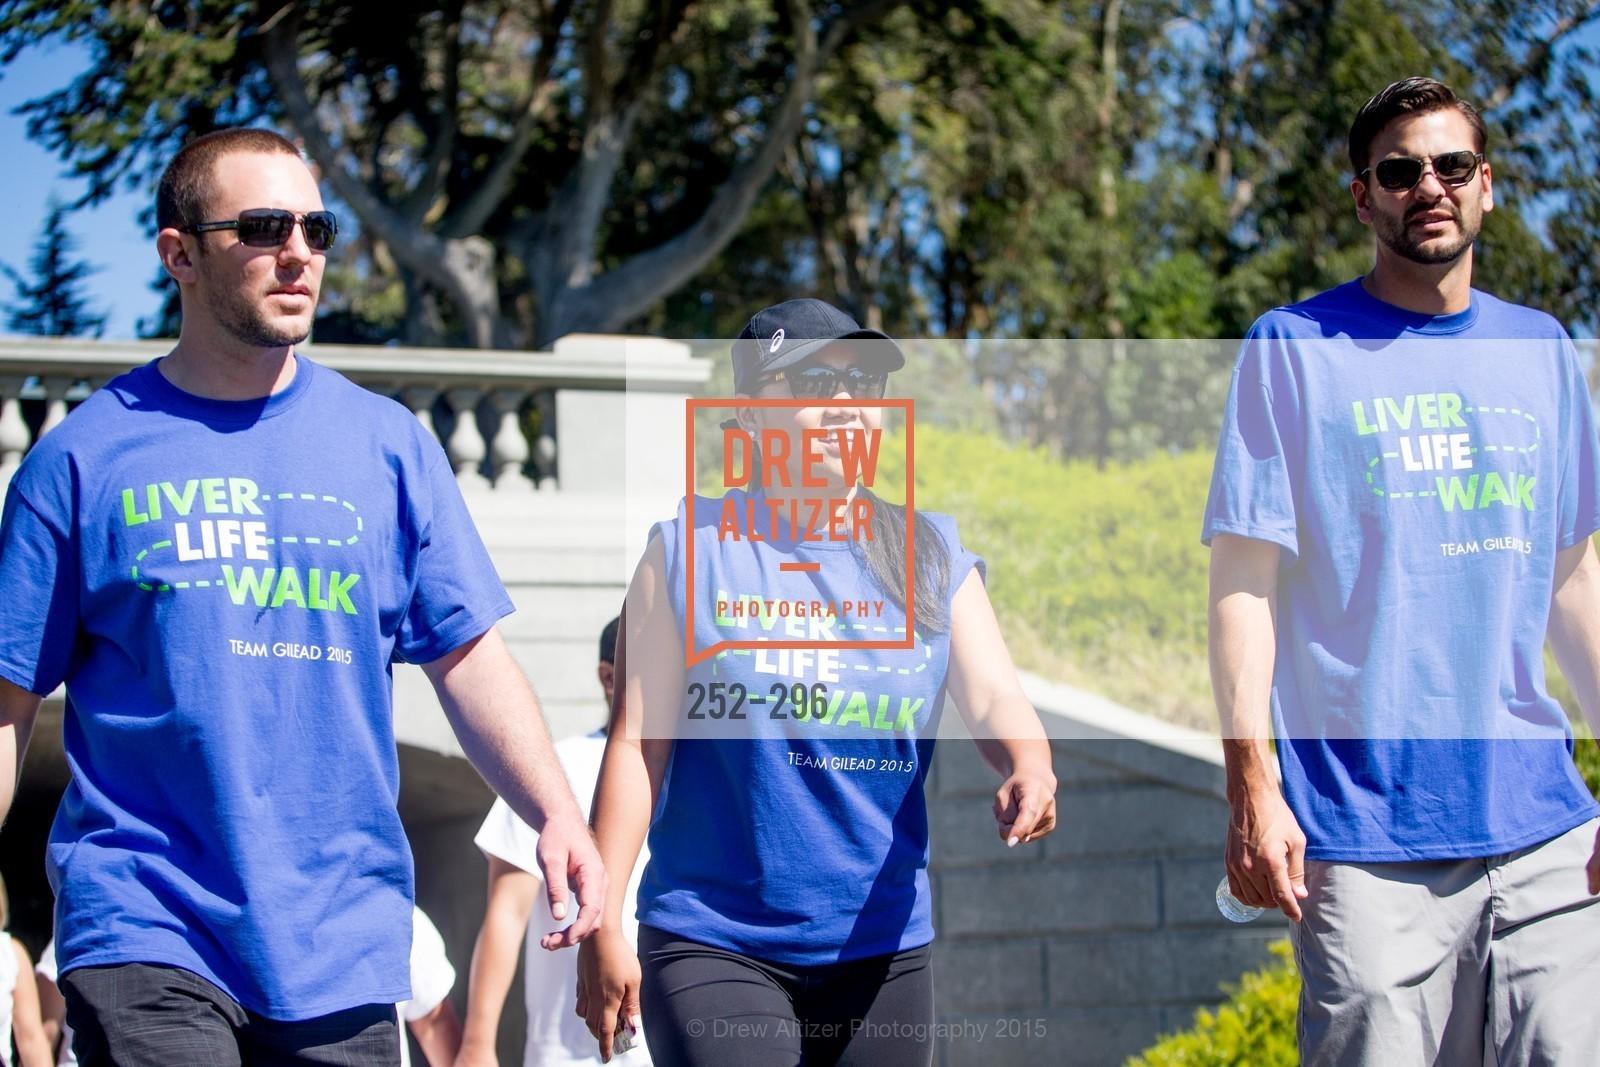 Extras, American Liver Foundation - San Francisco Liver Life Walk 2015, September 20th, 2015, Photo,Drew Altizer, Drew Altizer Photography, full-service agency, private events, San Francisco photographer, photographer california